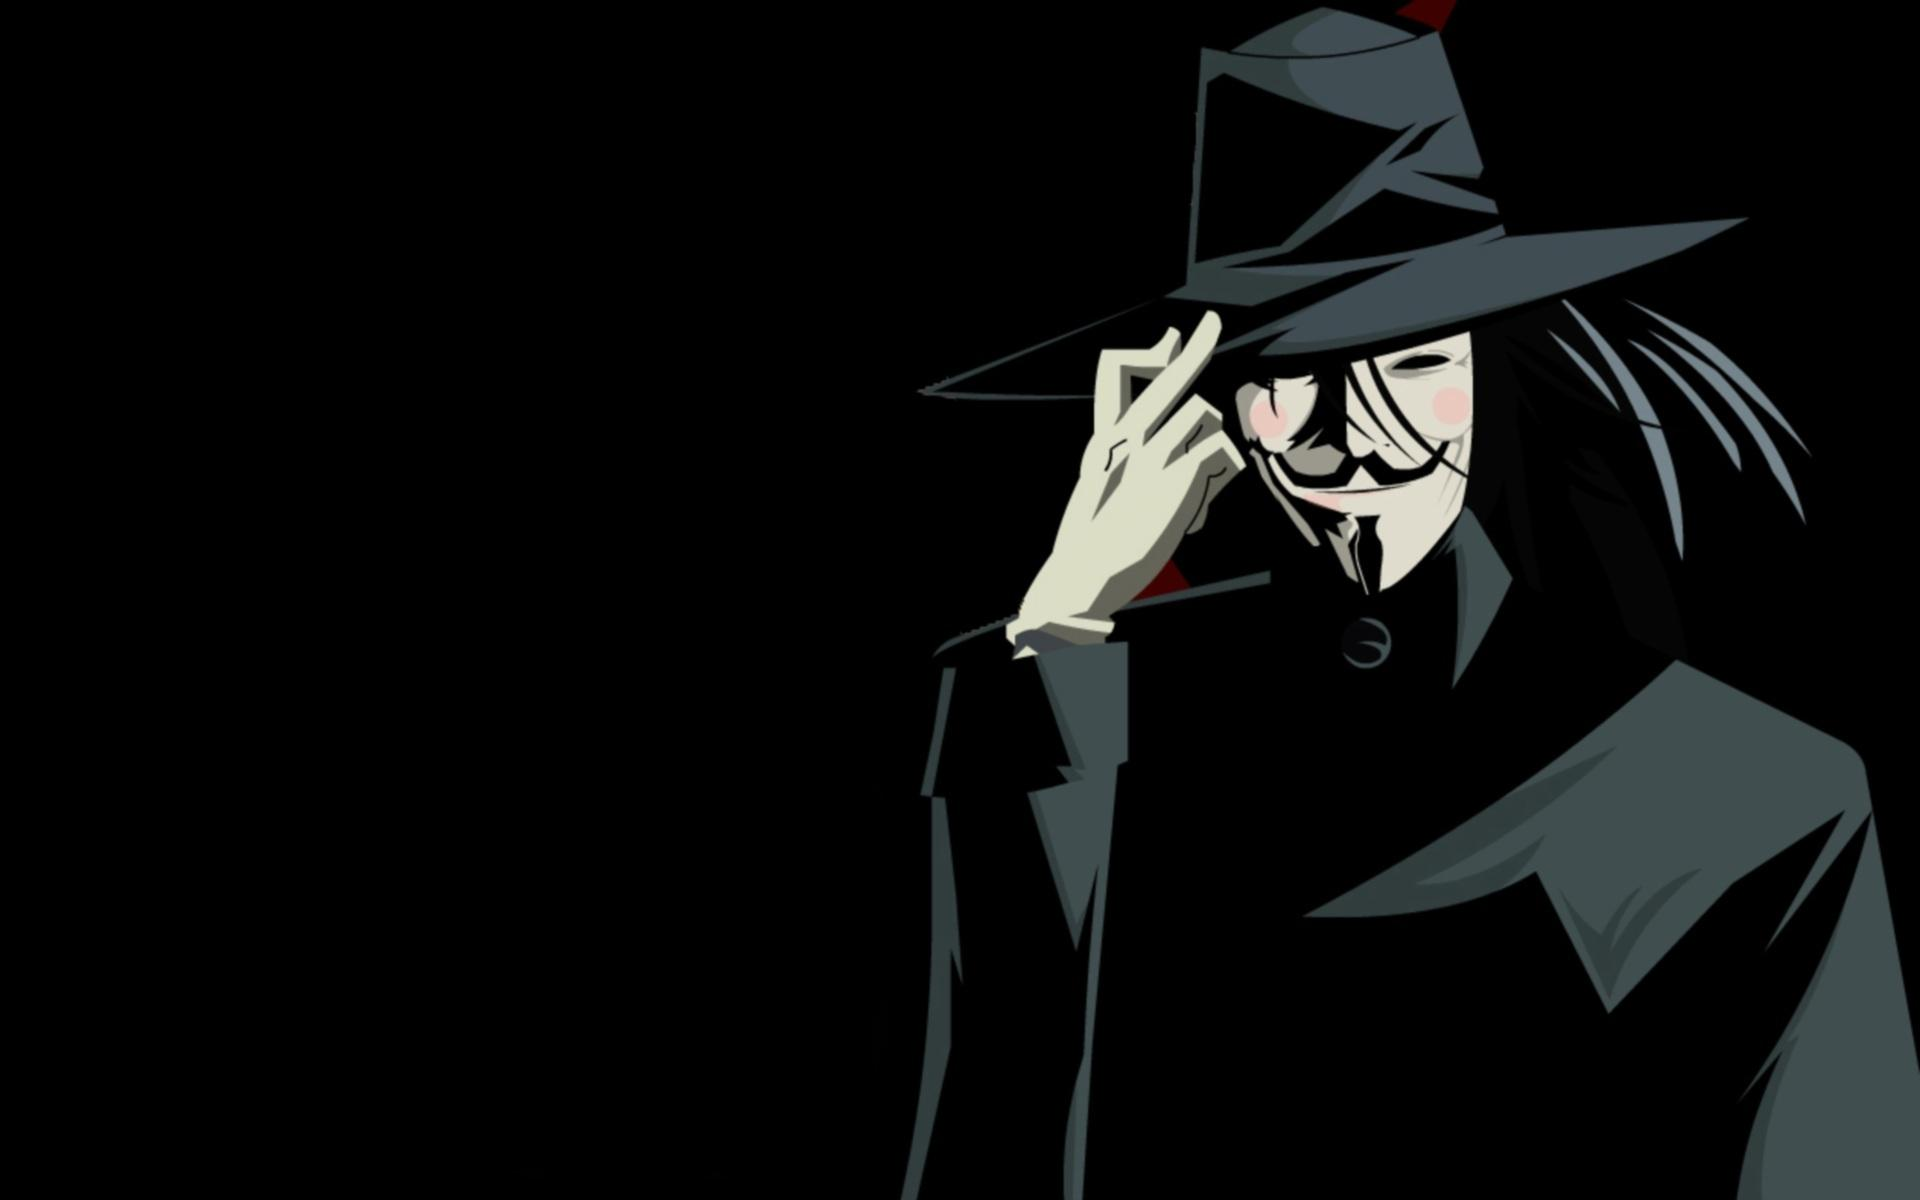 V For Vendetta Widescreen Wallpaper